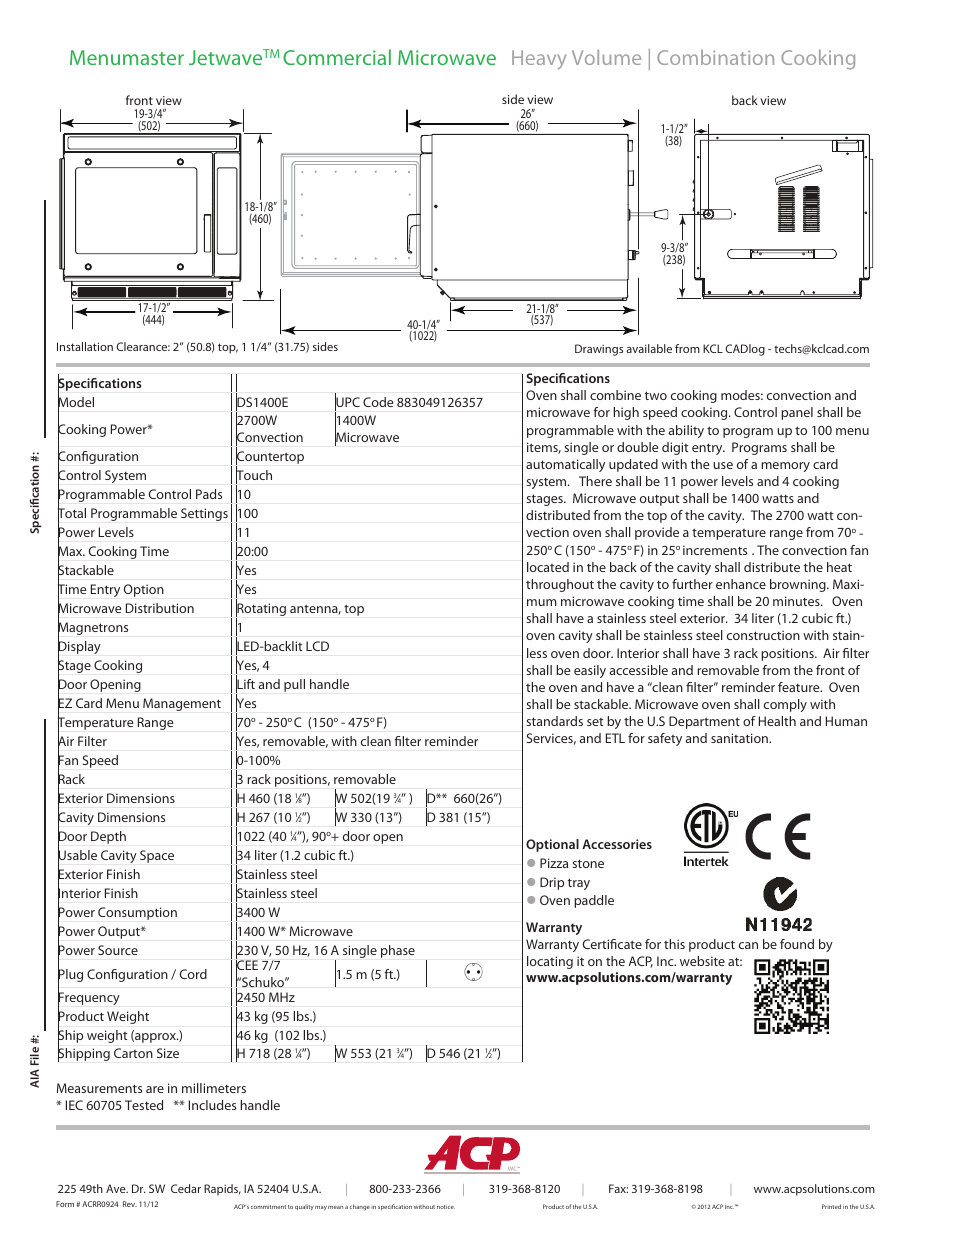 Menumaster jetwave   ACP DS1400E Spec Sheet User Manual   Page 2 / 2